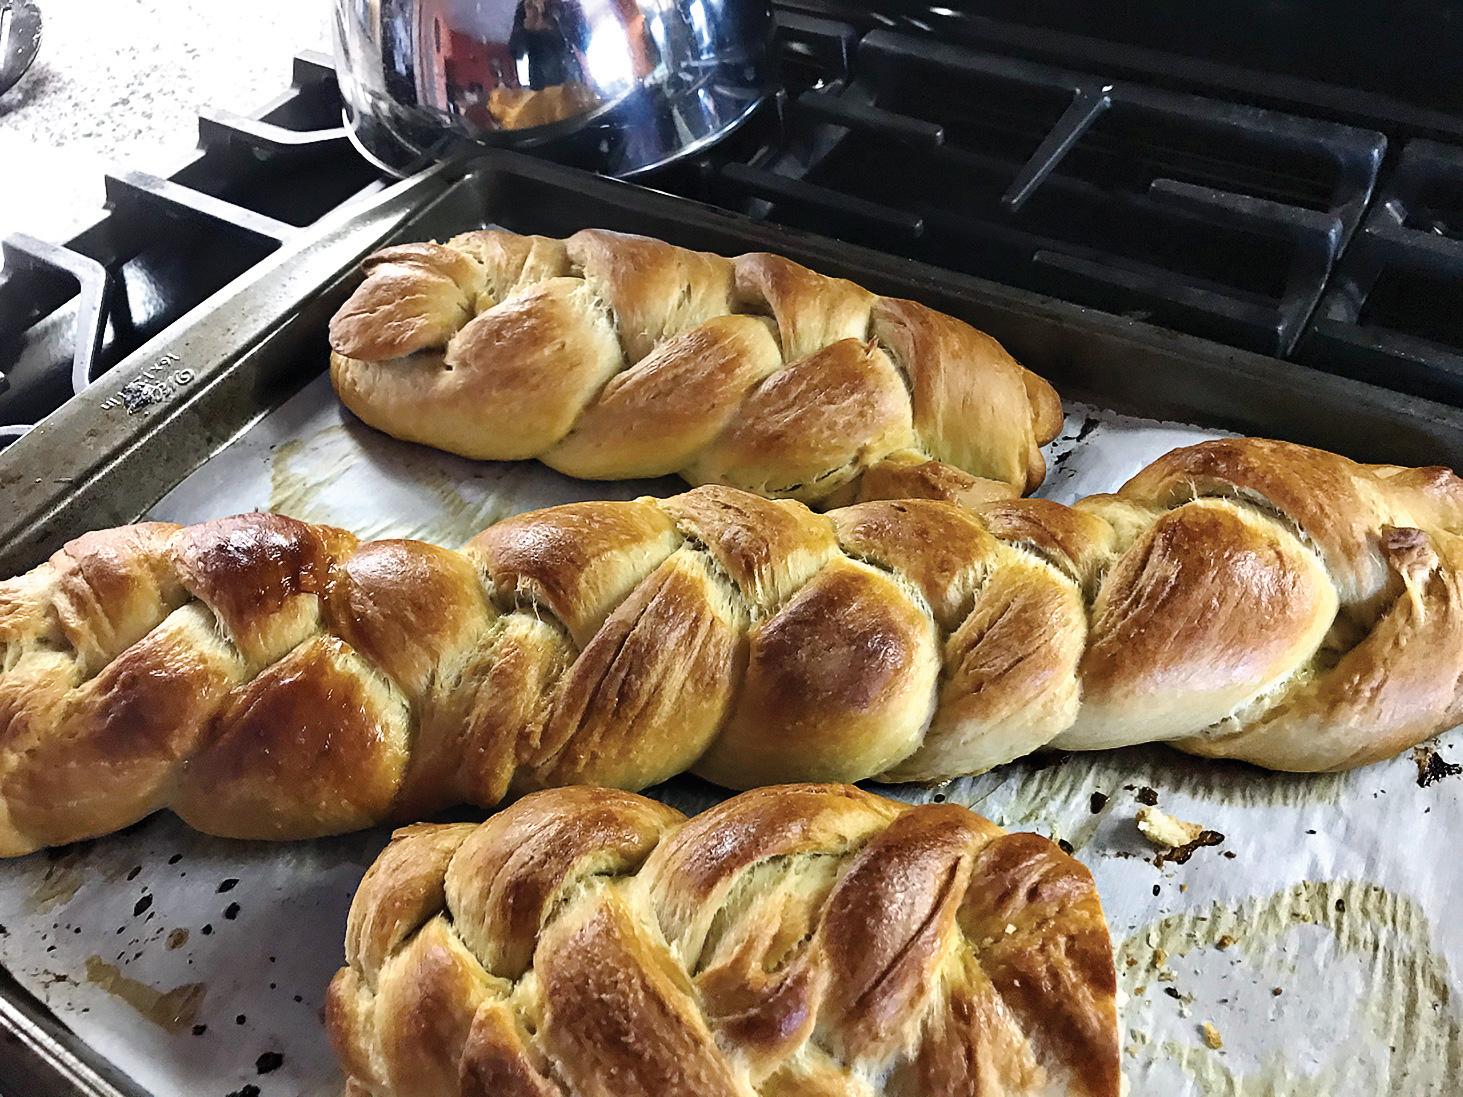 Sheryl Berman's bread